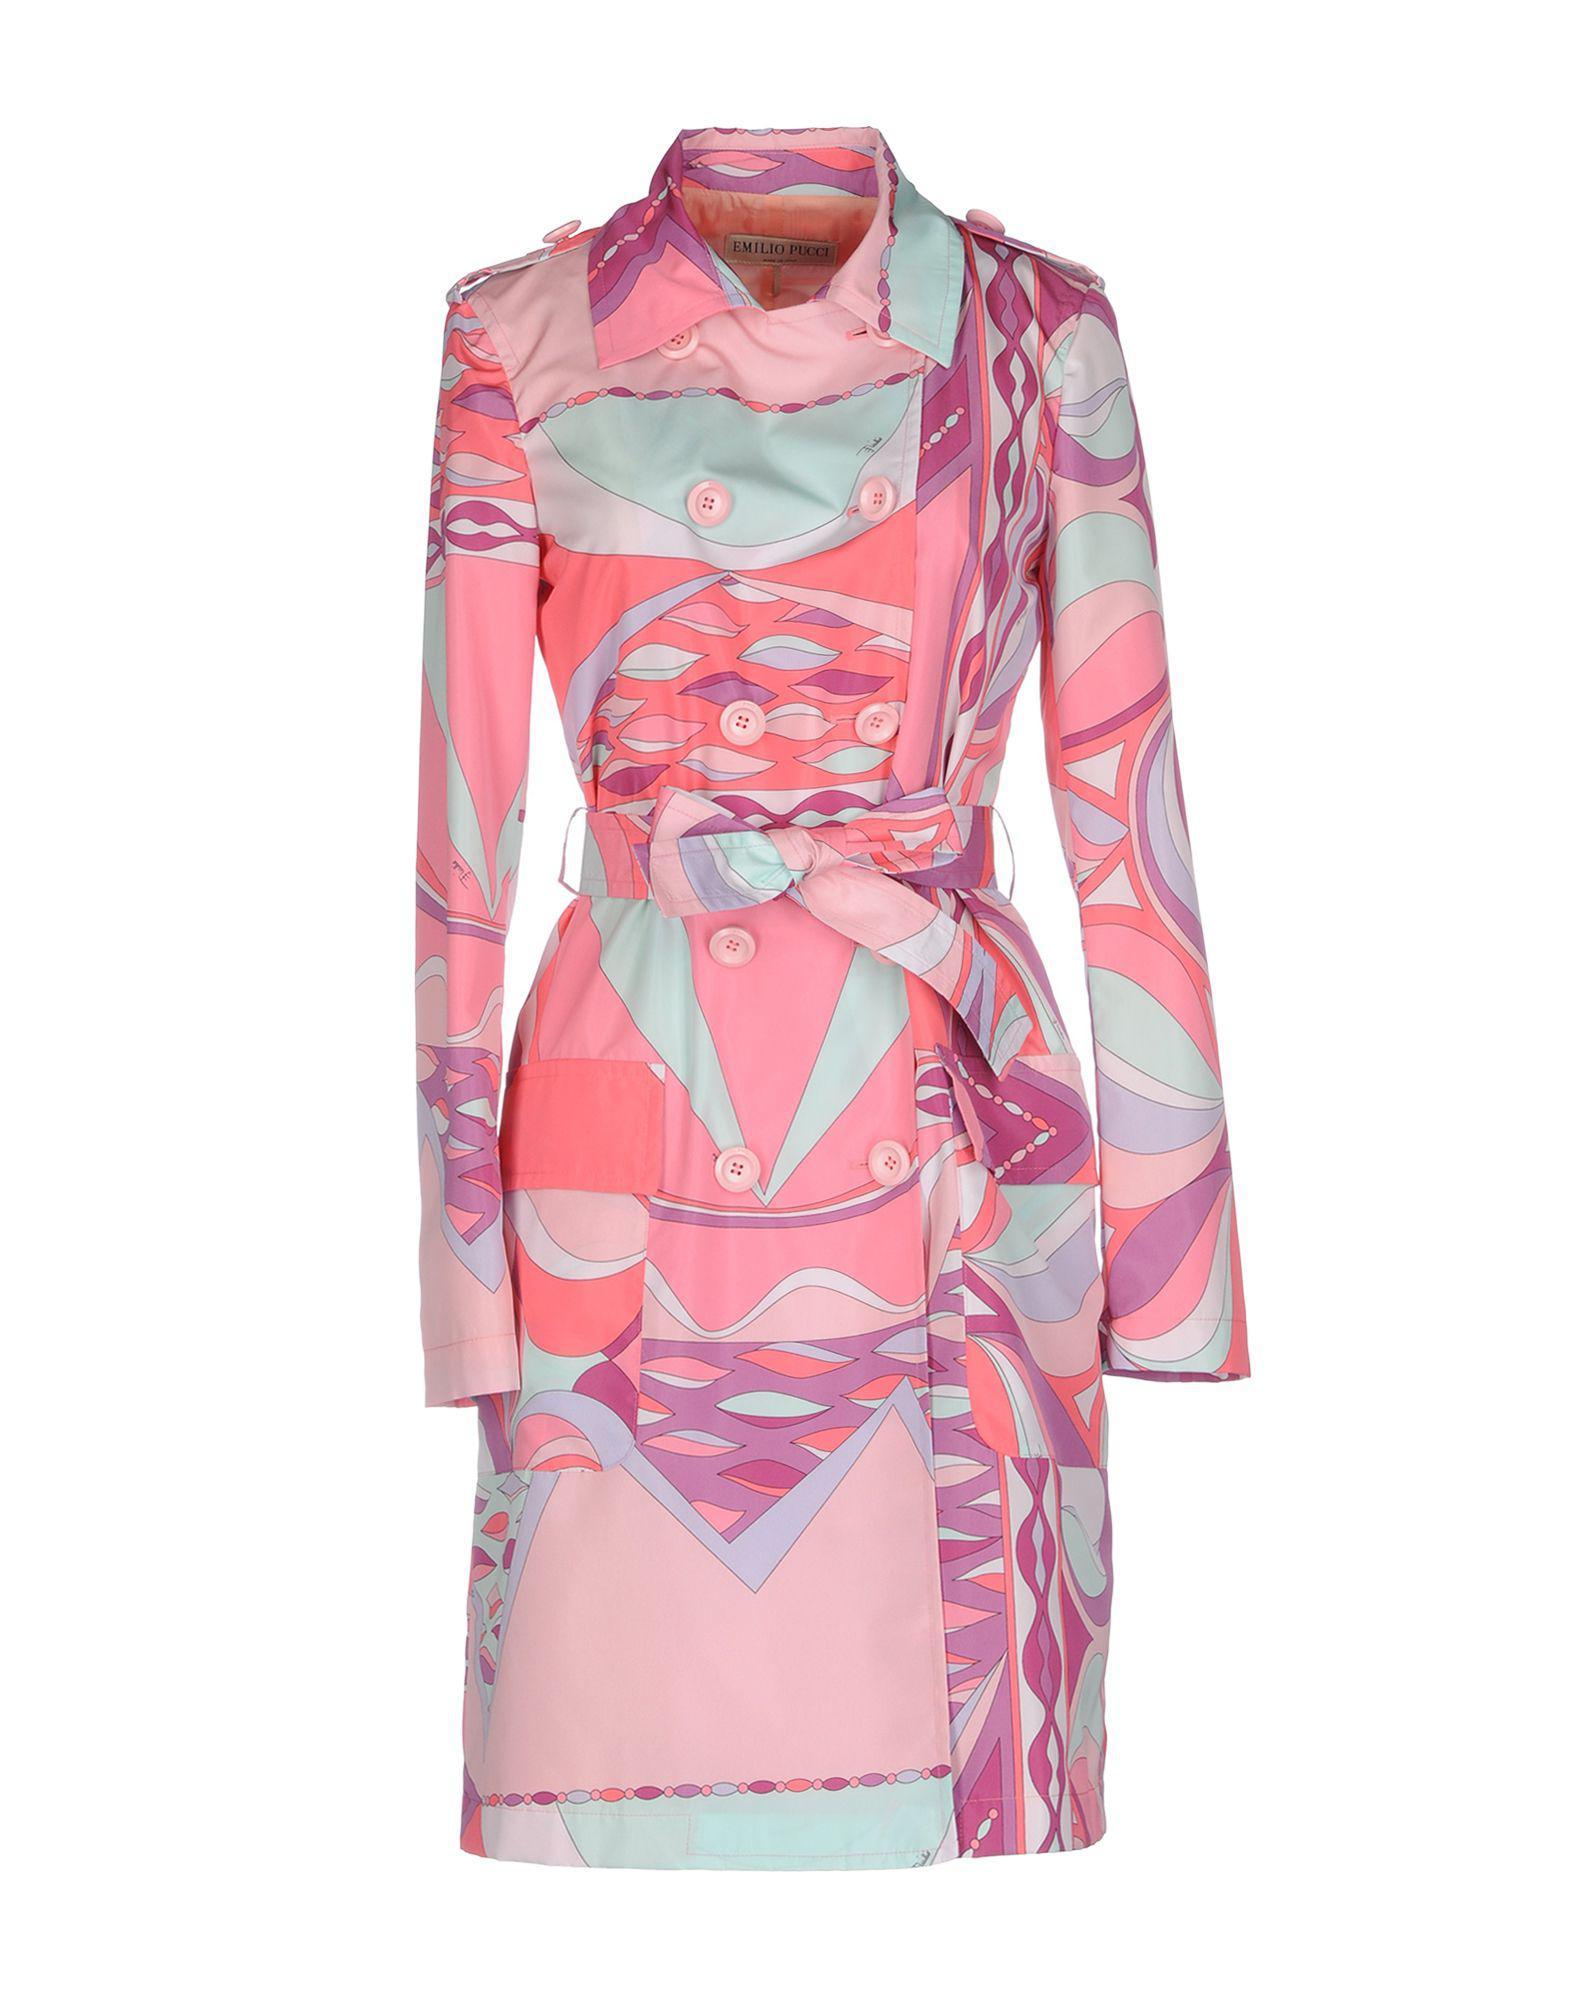 befd9656cdaa Emilio Pucci Overcoat in Pink - Lyst